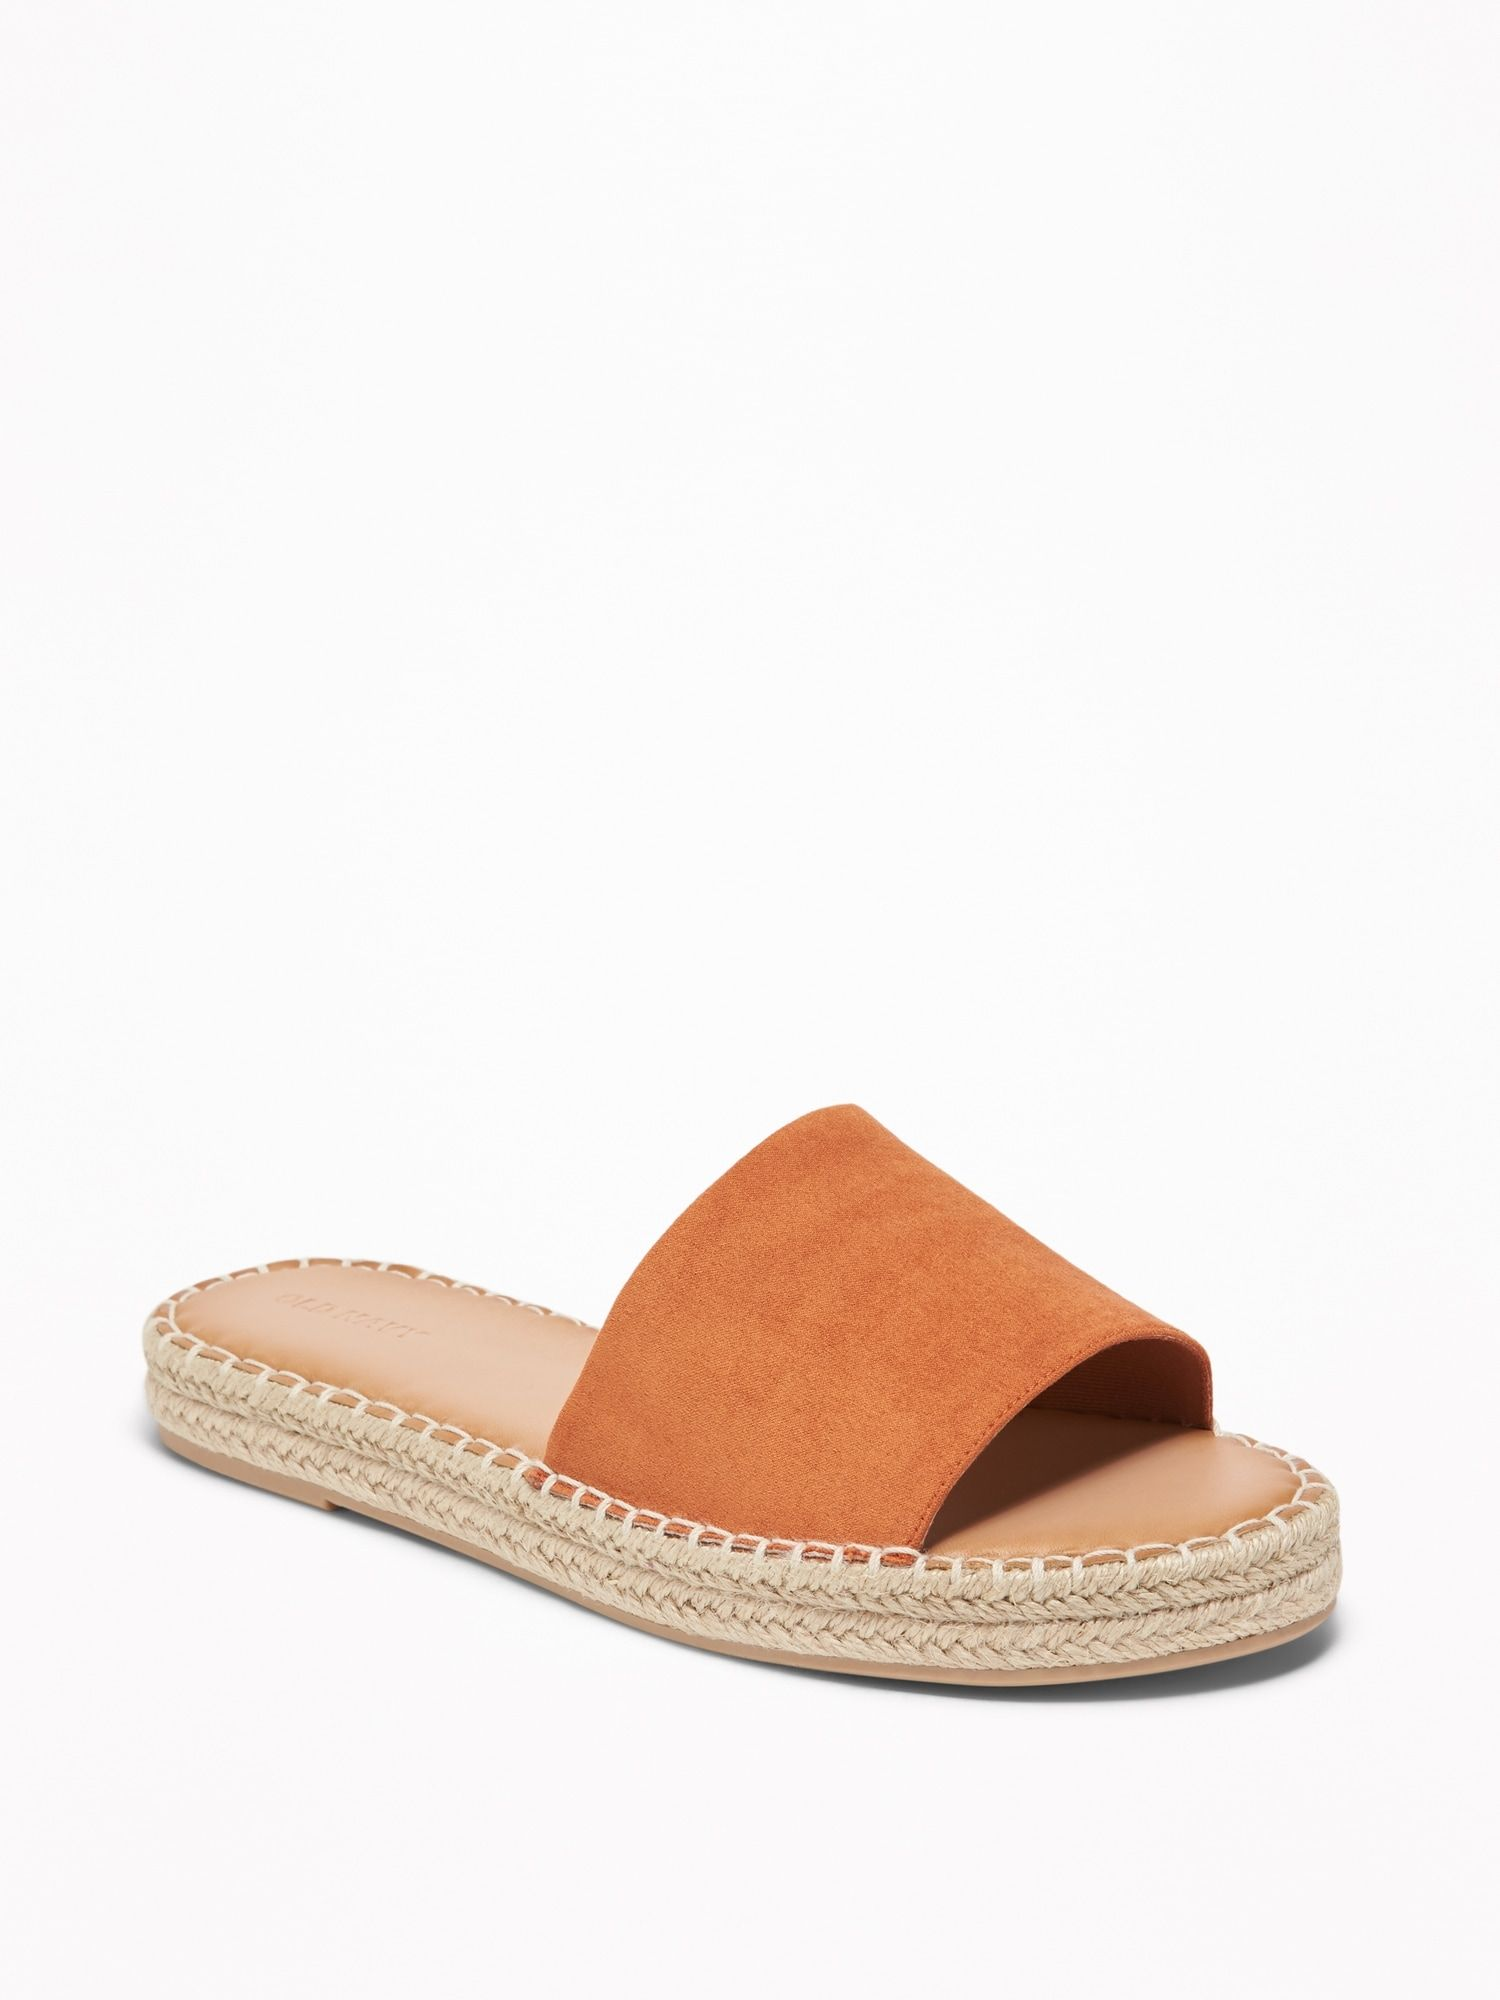 Faux Suede Slide Espadrille Sandals for Women | Old Navy